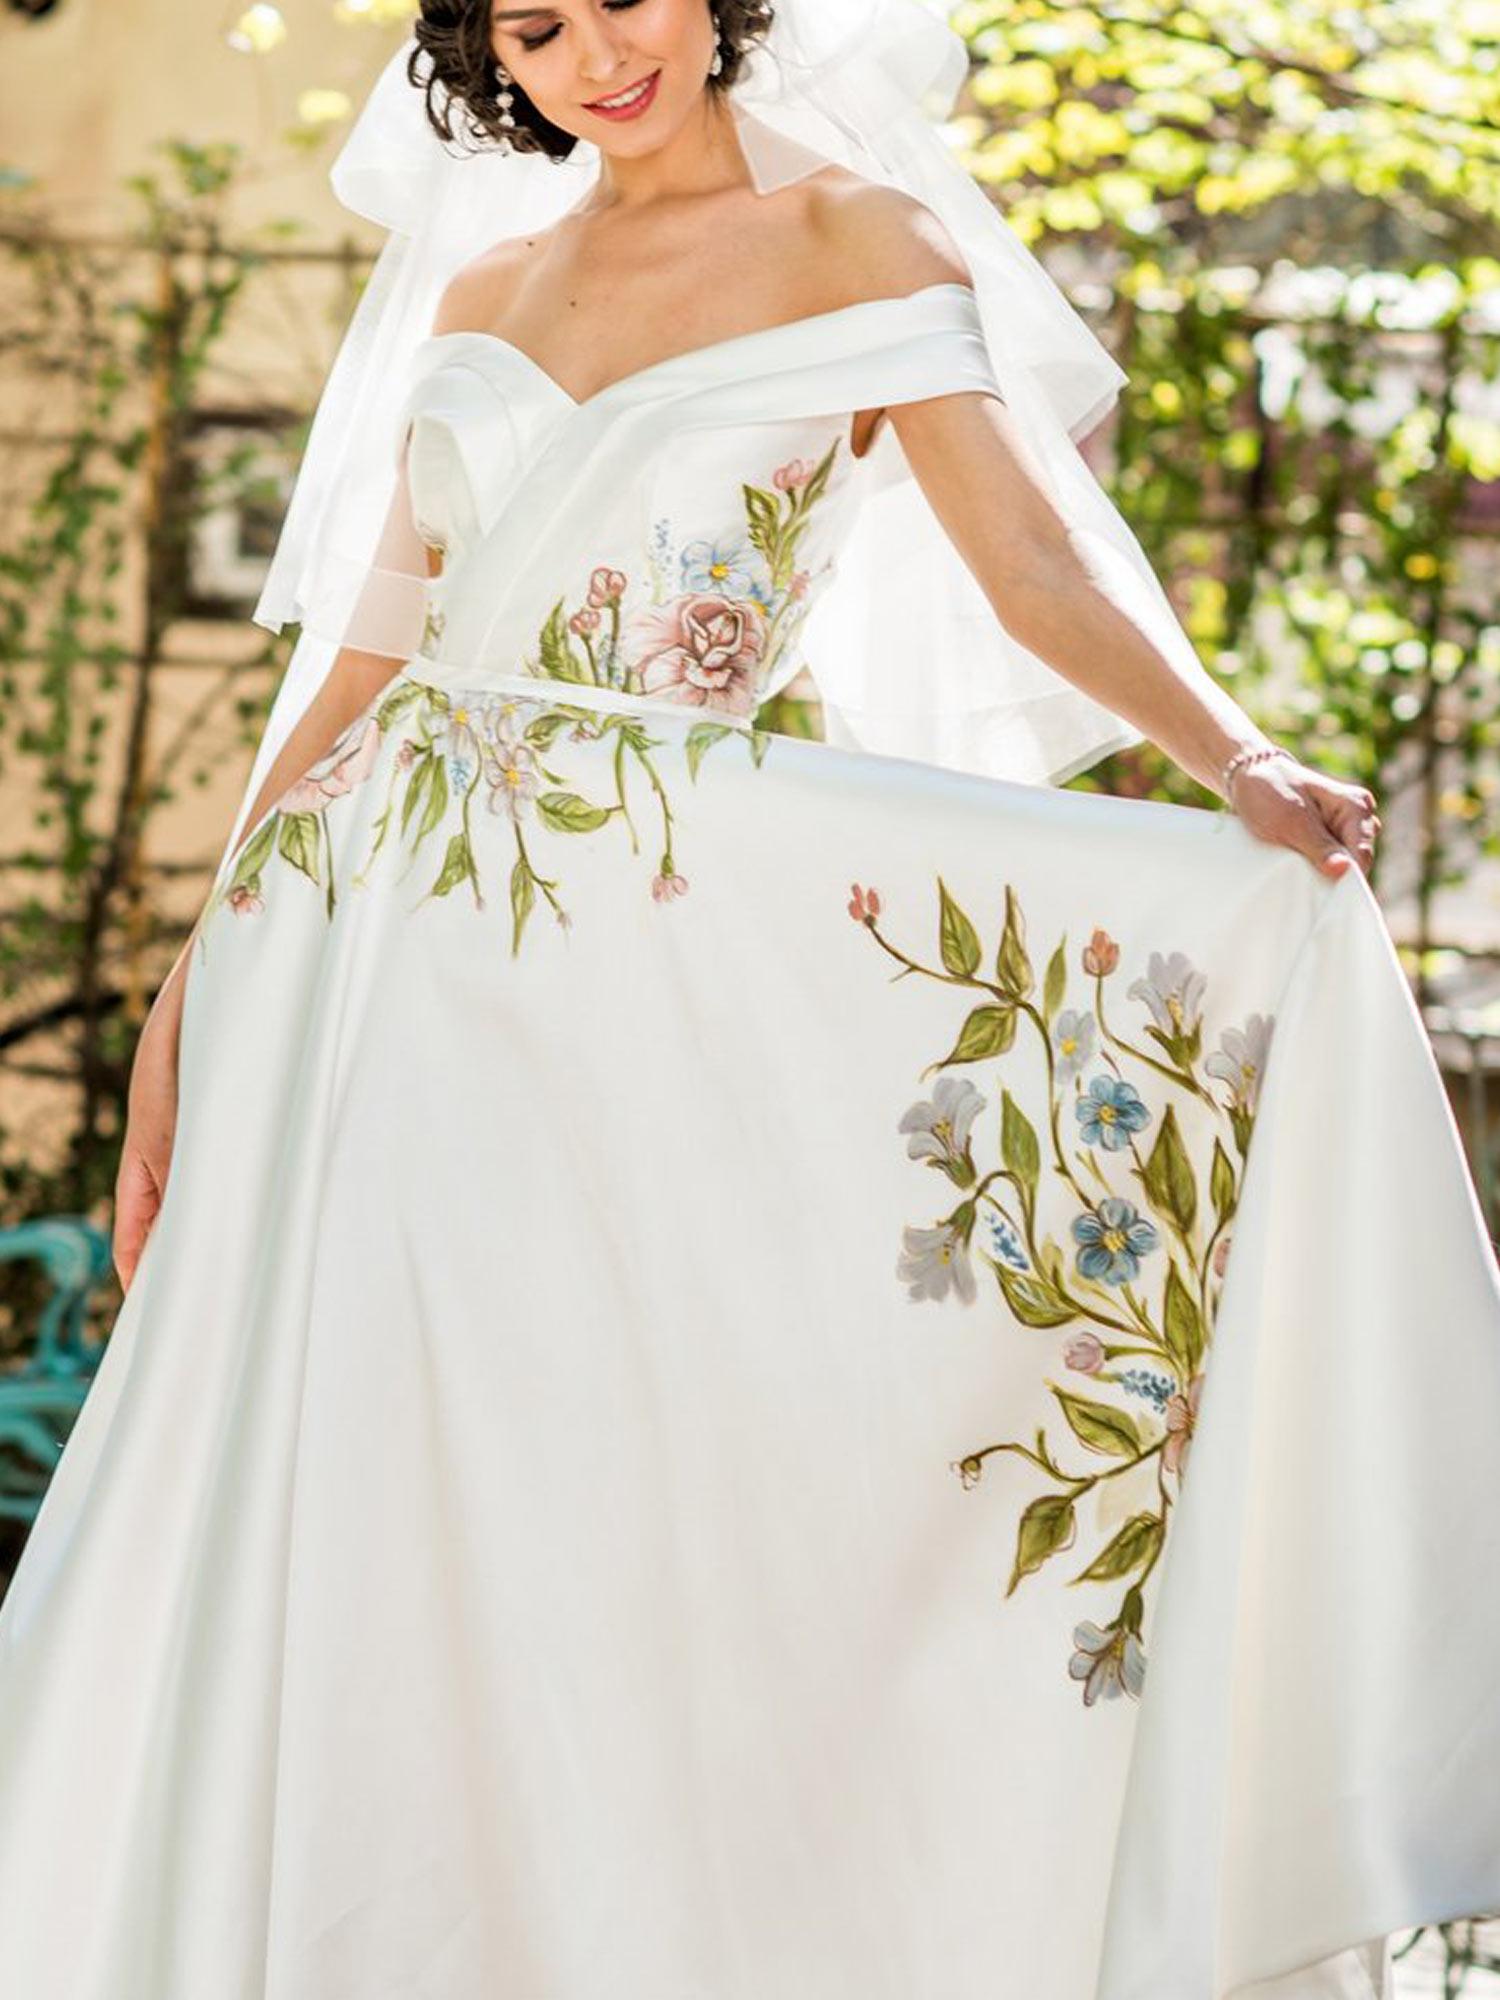 Jardin,-the-Hand-Painted-Floral-Wedding-Dress-(5).jpg